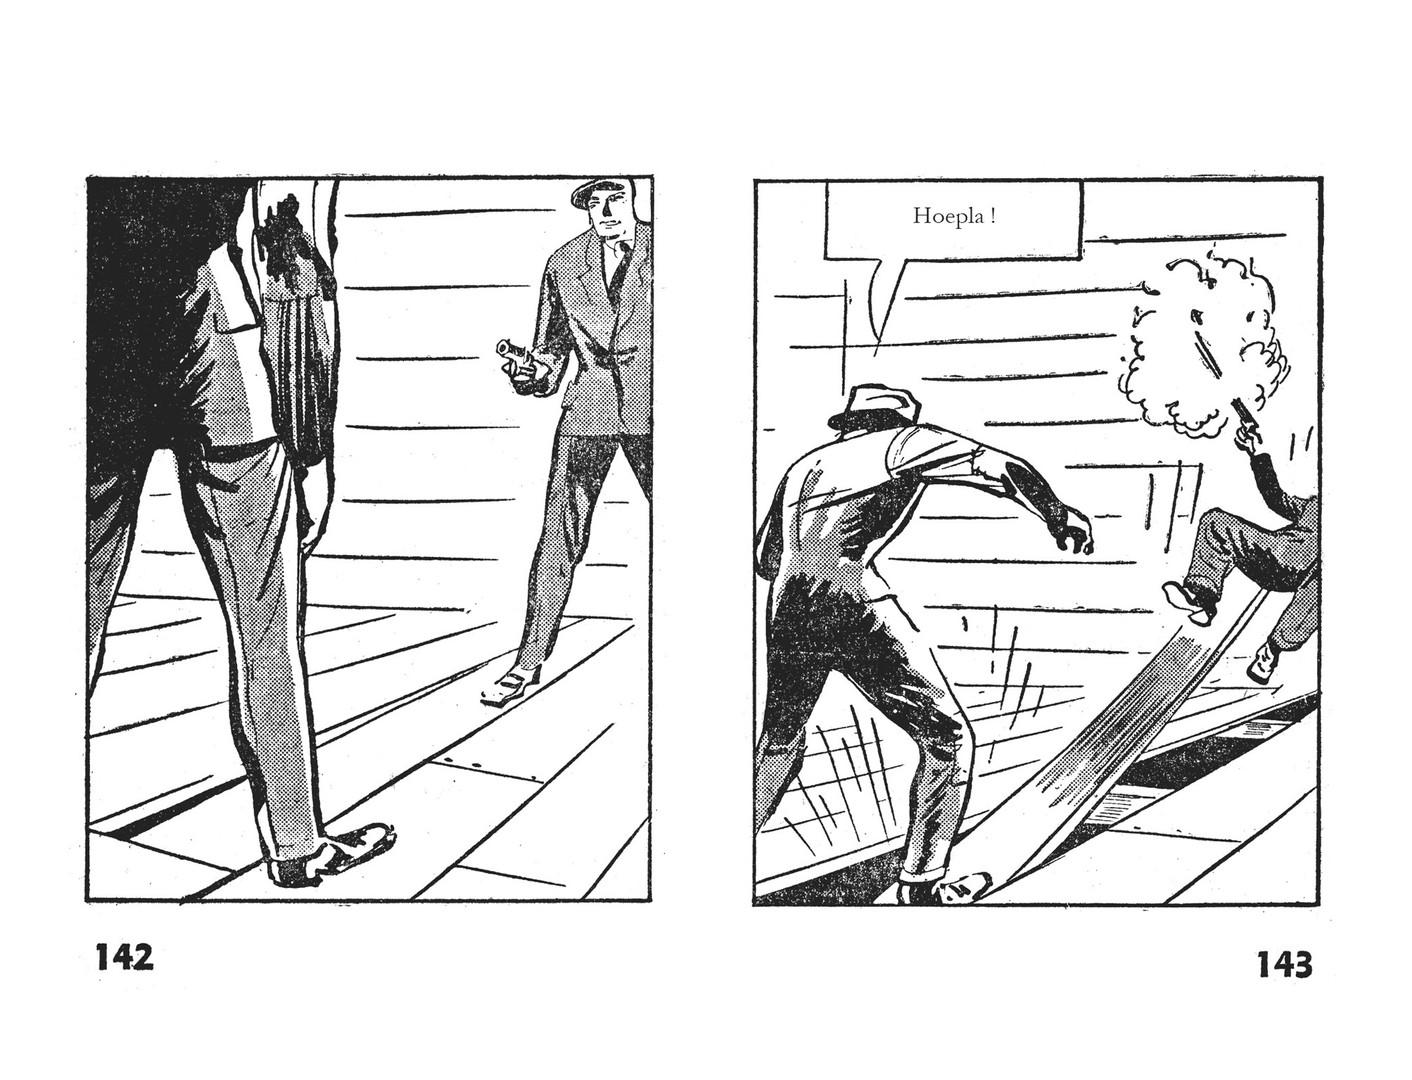 190810_jiu_jitsu_pages-72.jpg